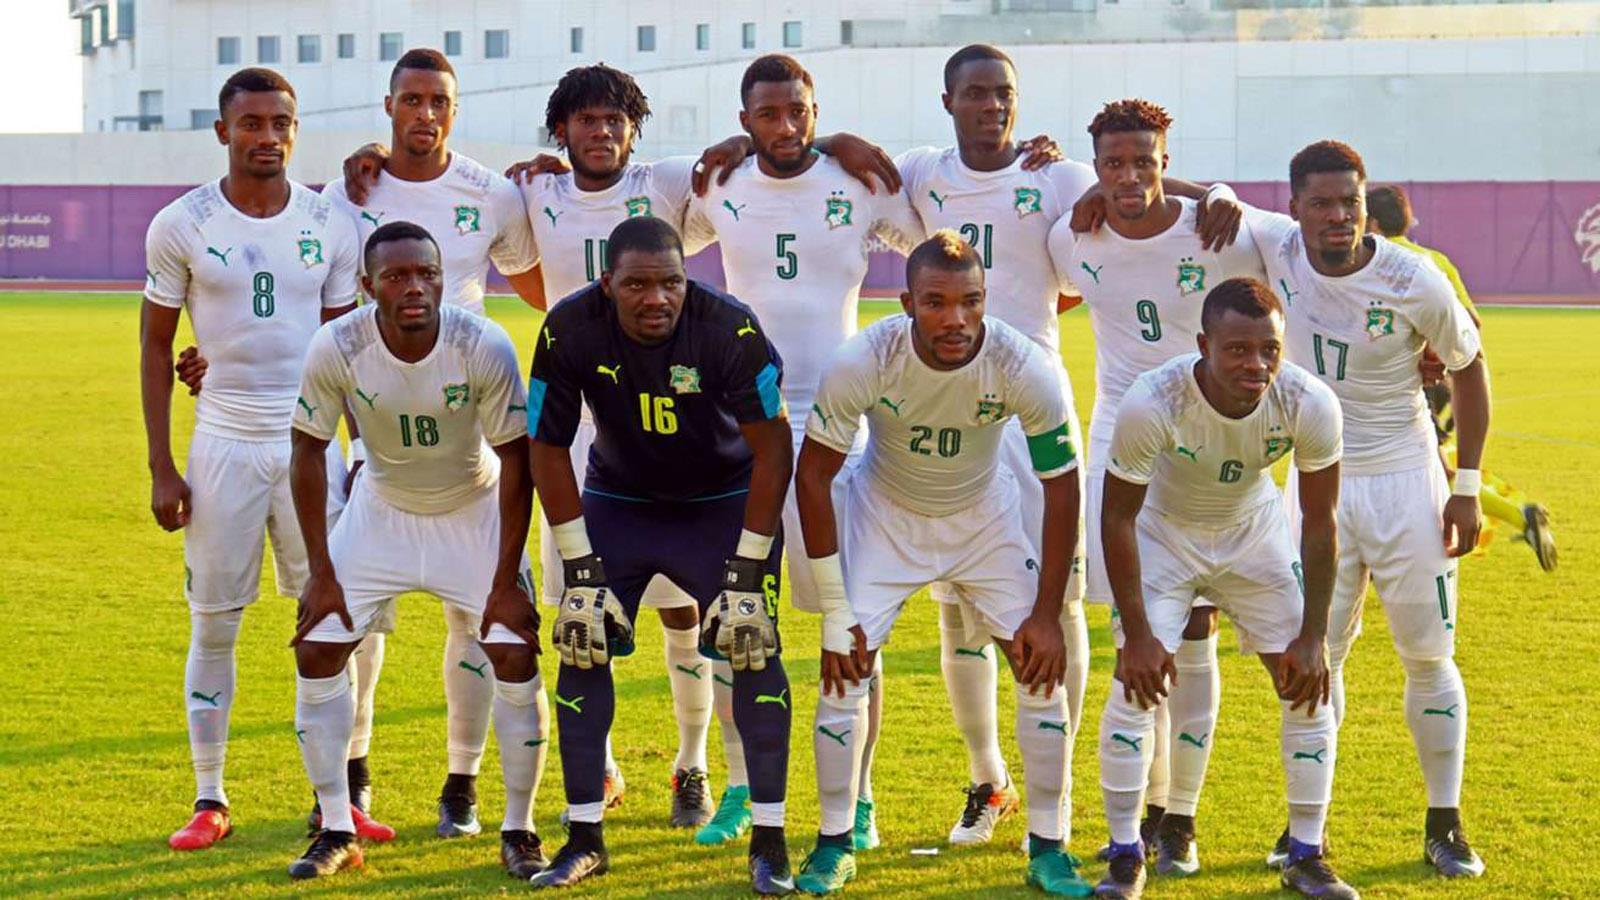 Zaha Scores First CIV Goal In AFCON Friendly Vs Uganda